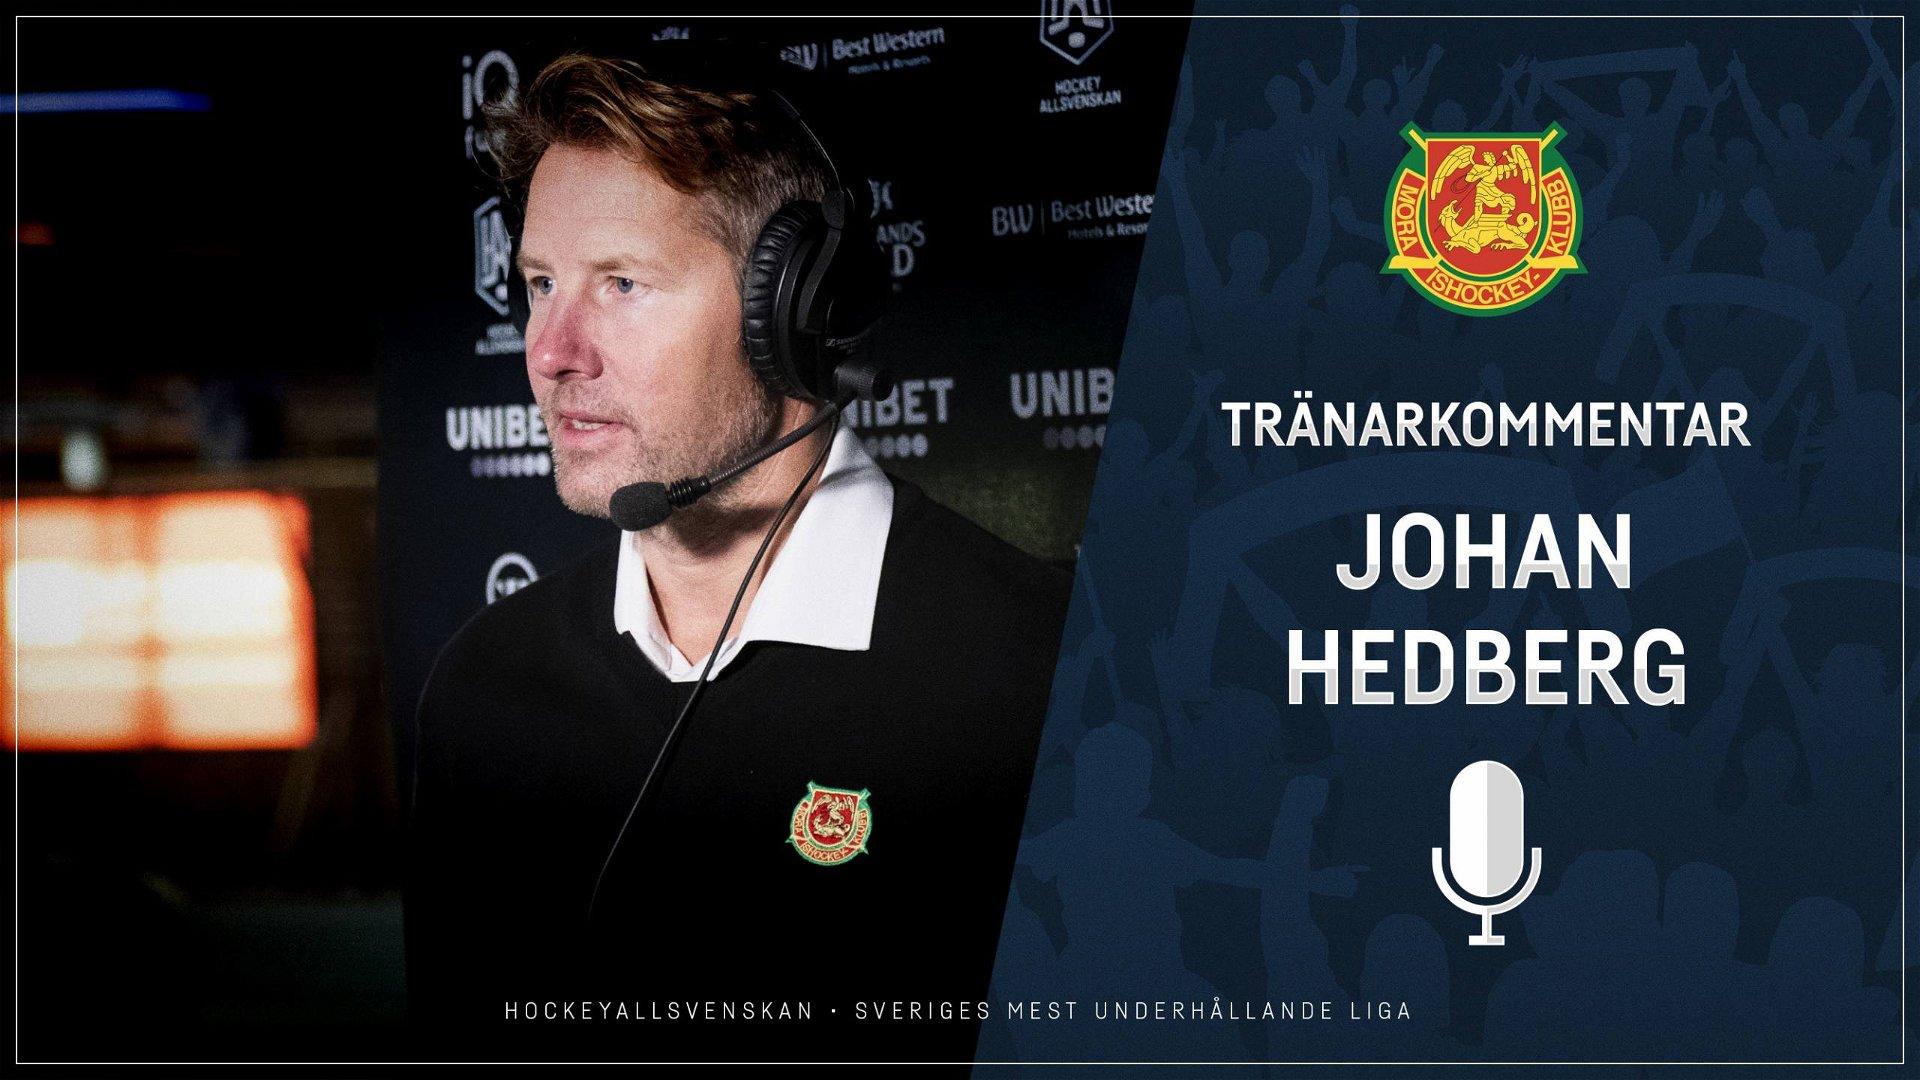 2020-11-06 Segerintervju: Johan Hedberg